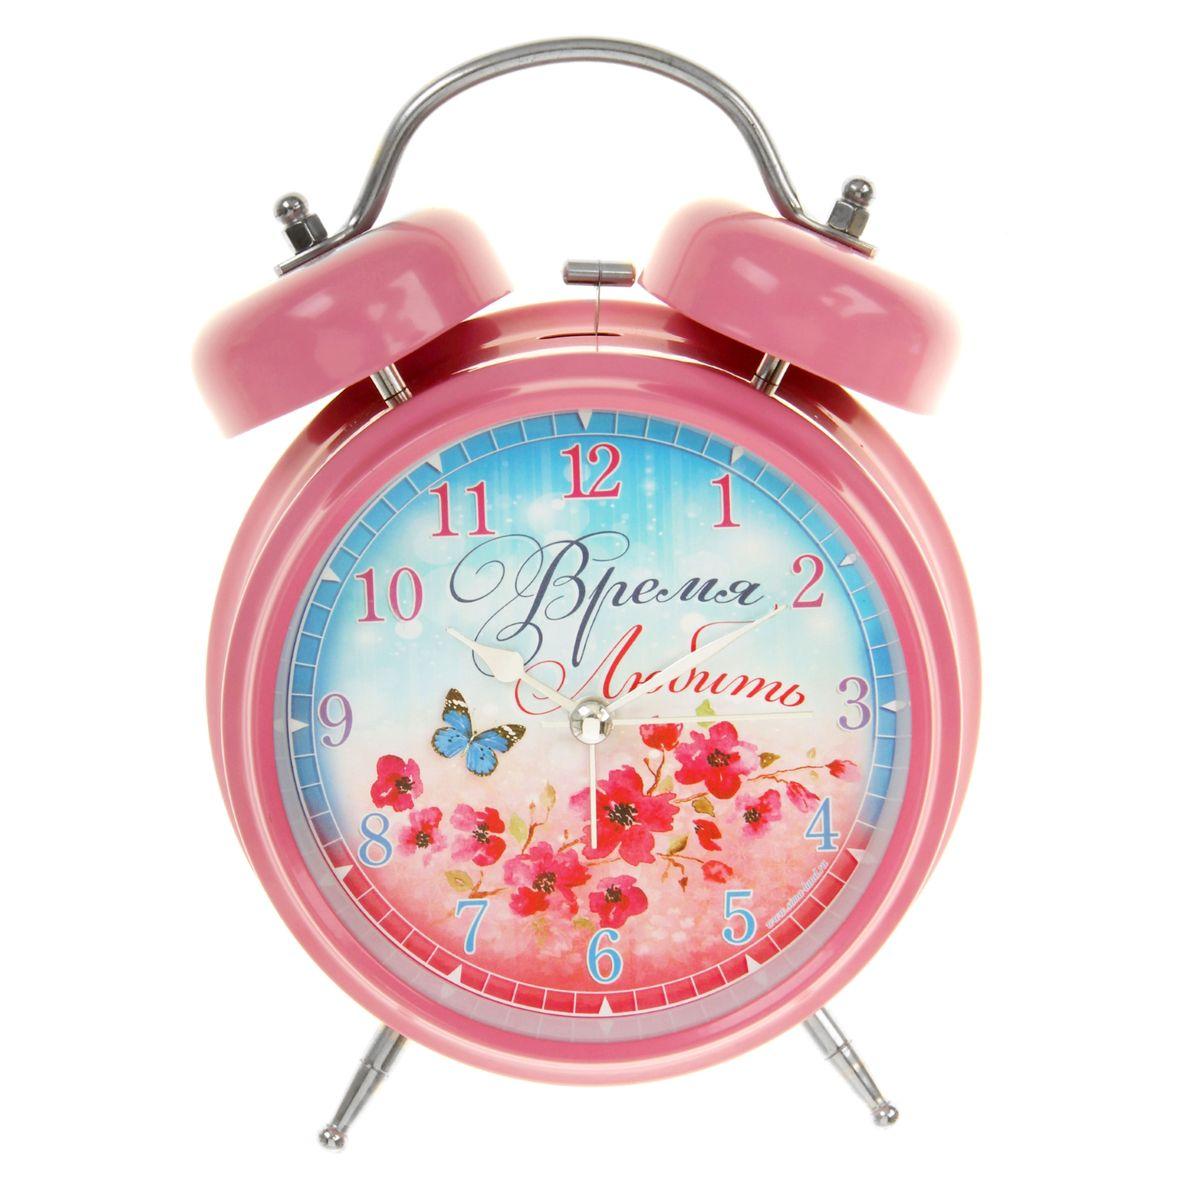 Часы-будильник Sima-land Время любить часы будильник sima land жду встречи